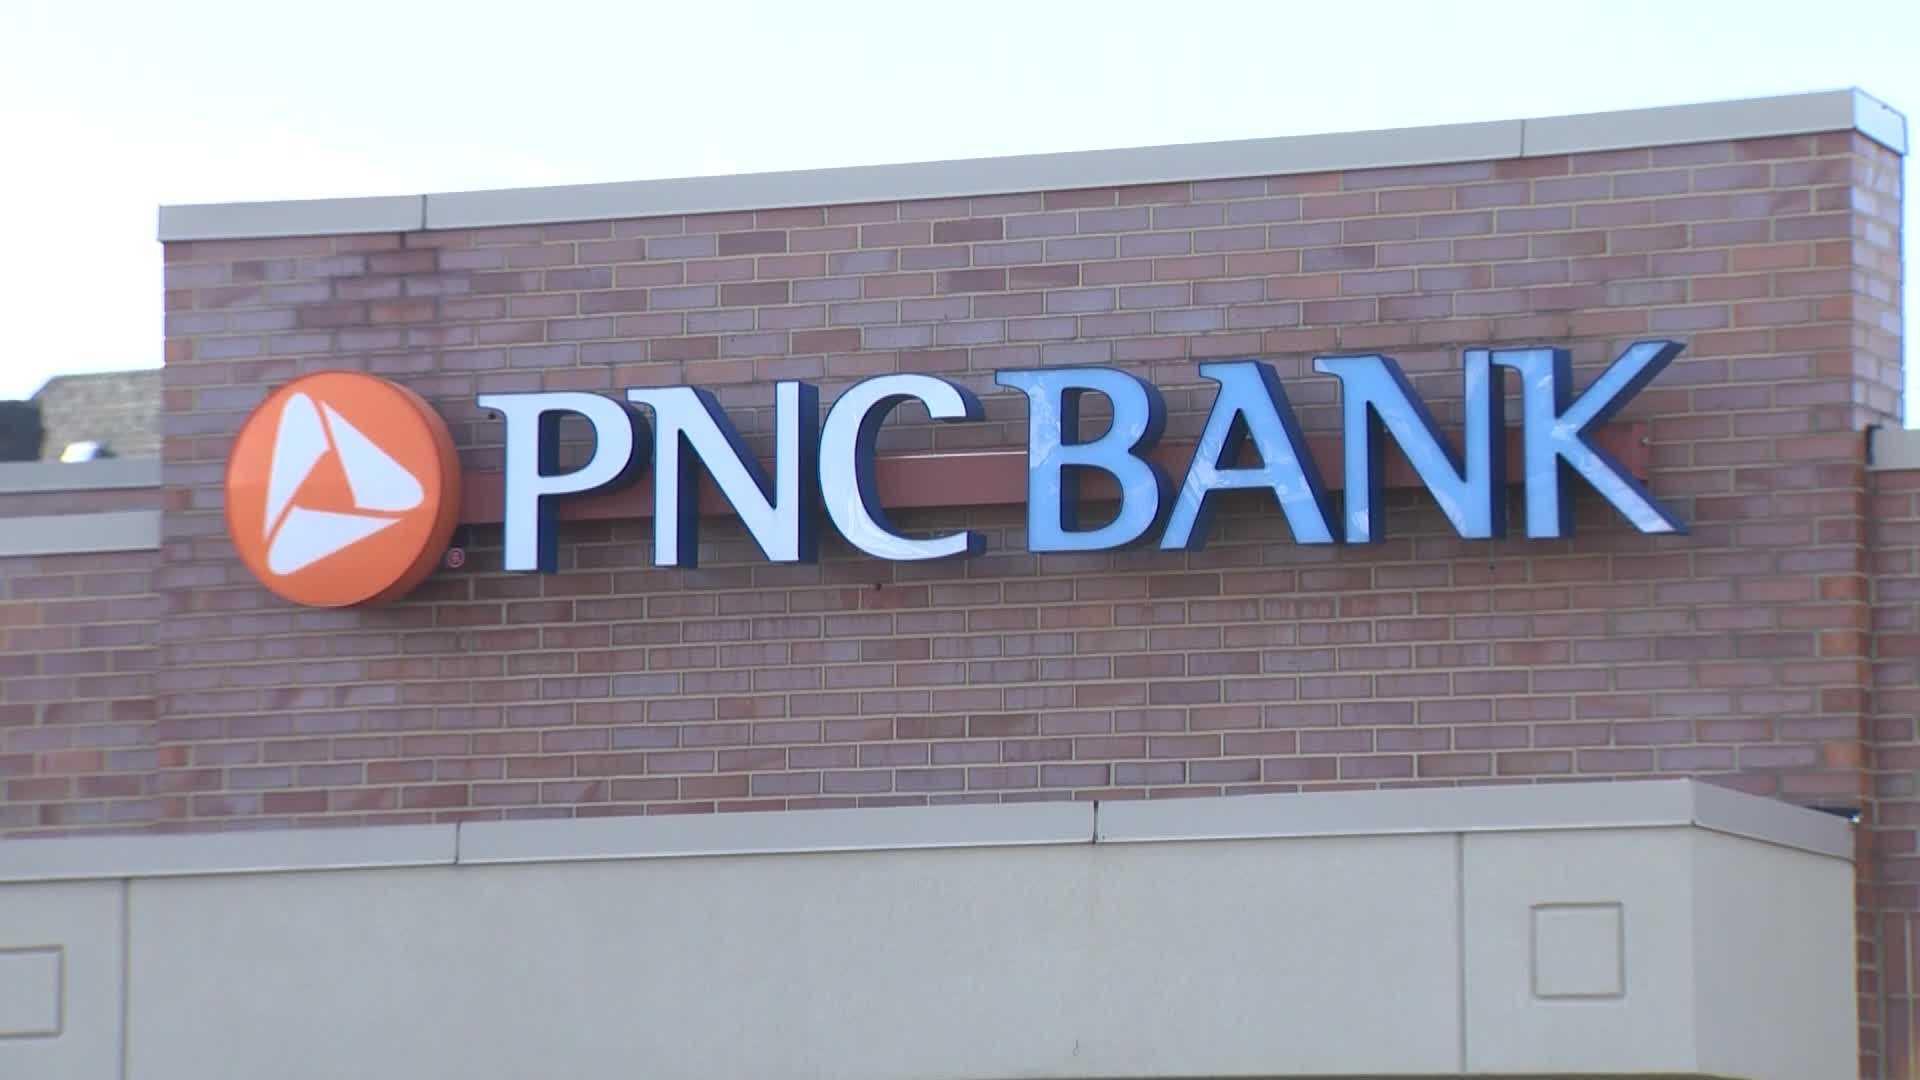 PNC Bank sign